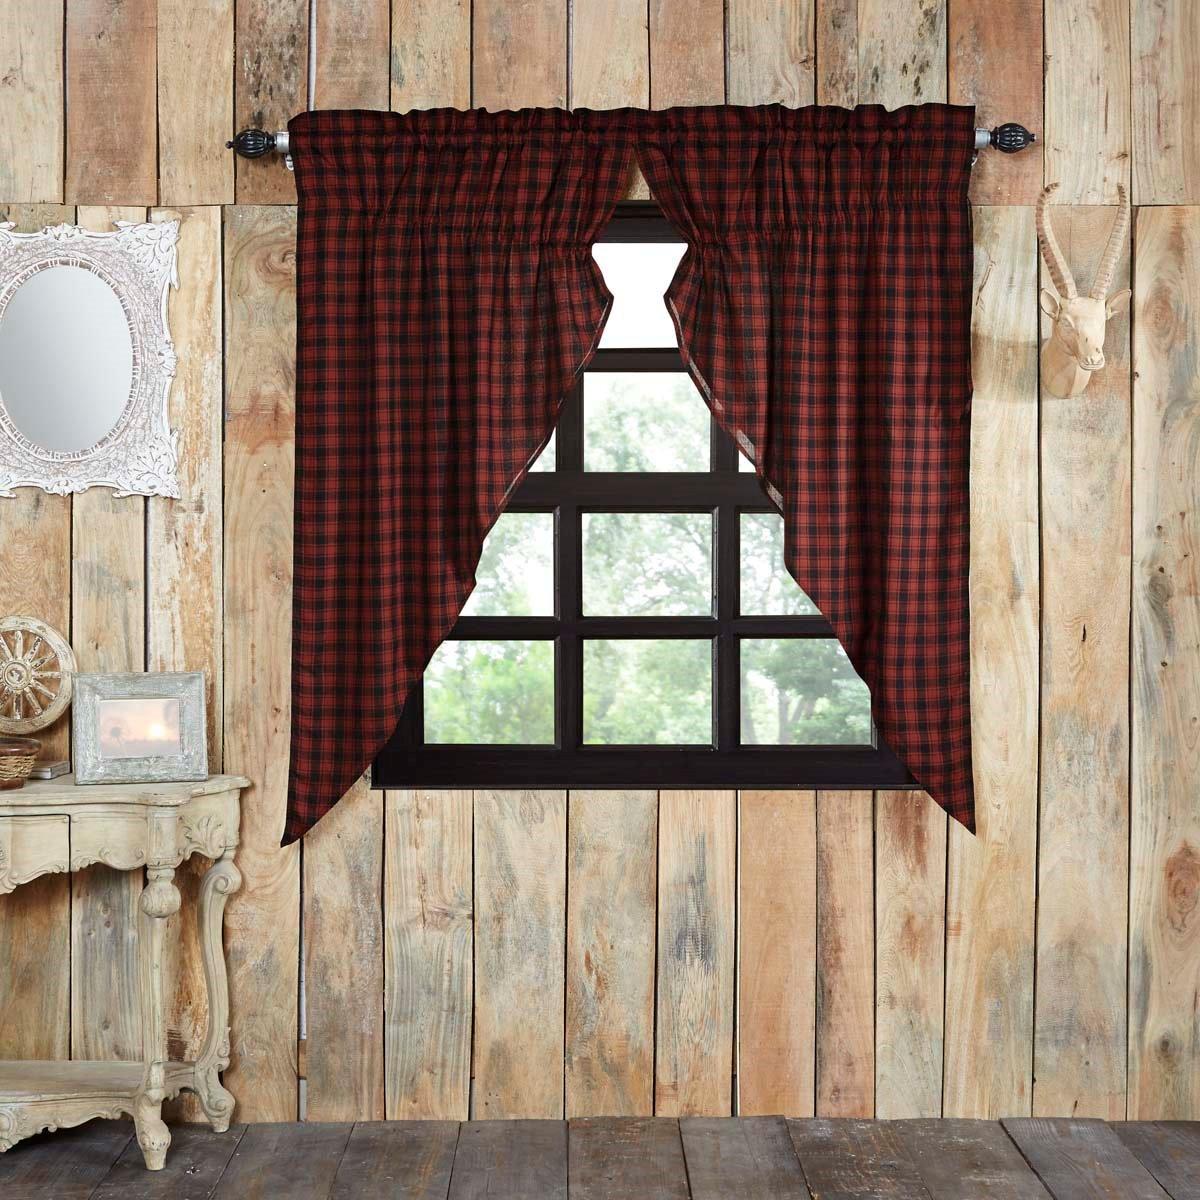 Cumberland Prairie Curtain set of 2 (63L x 36W)